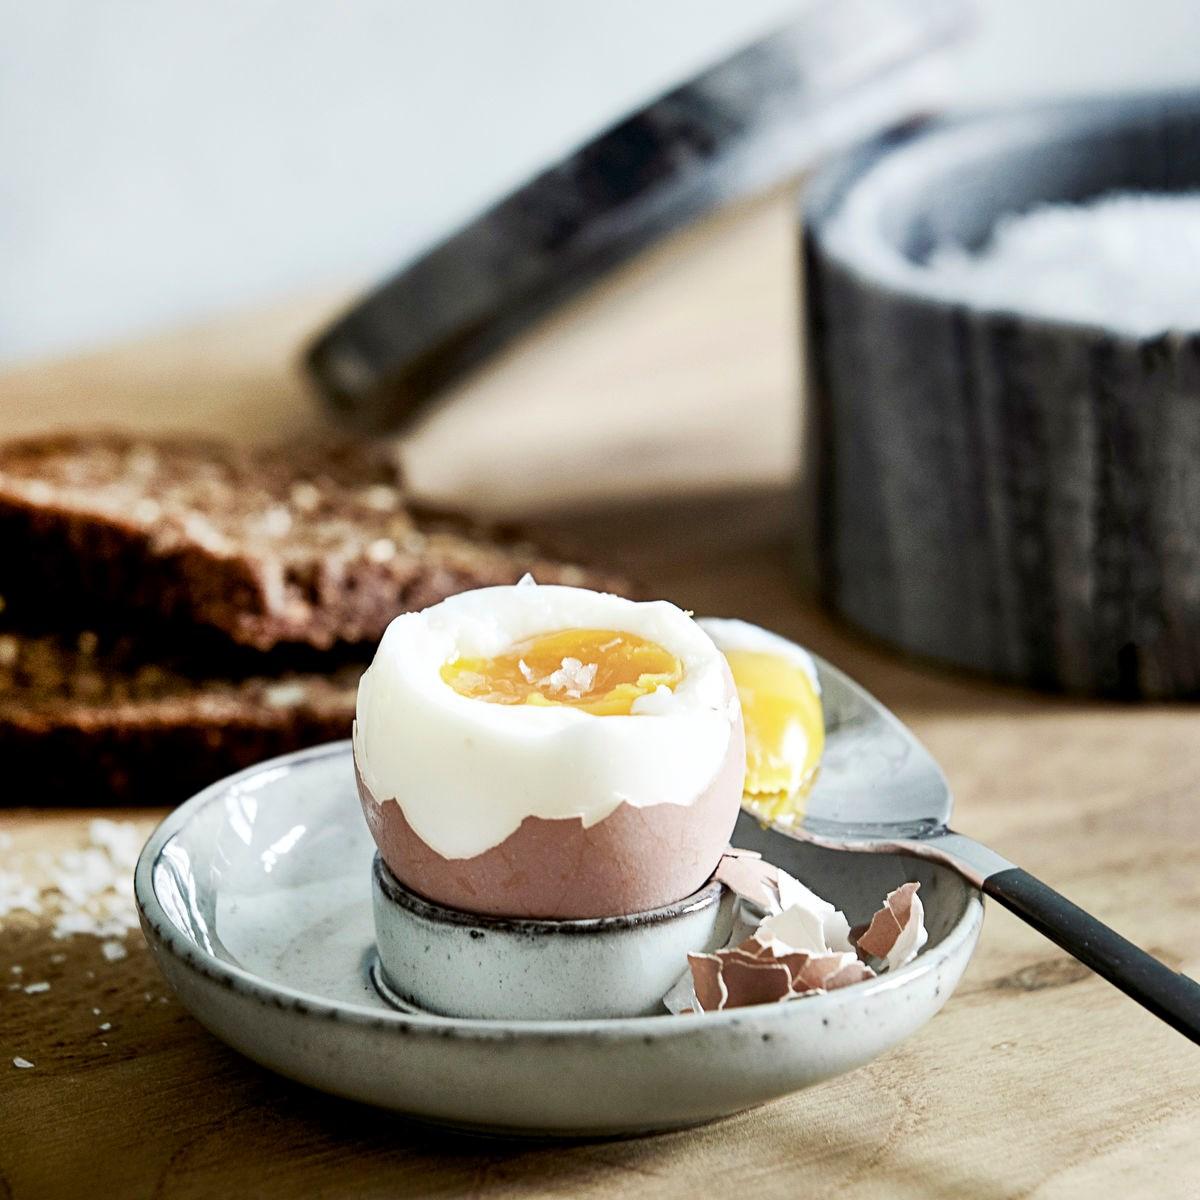 Miska/ stojan na vejce RUSTIC šedo modrá_1